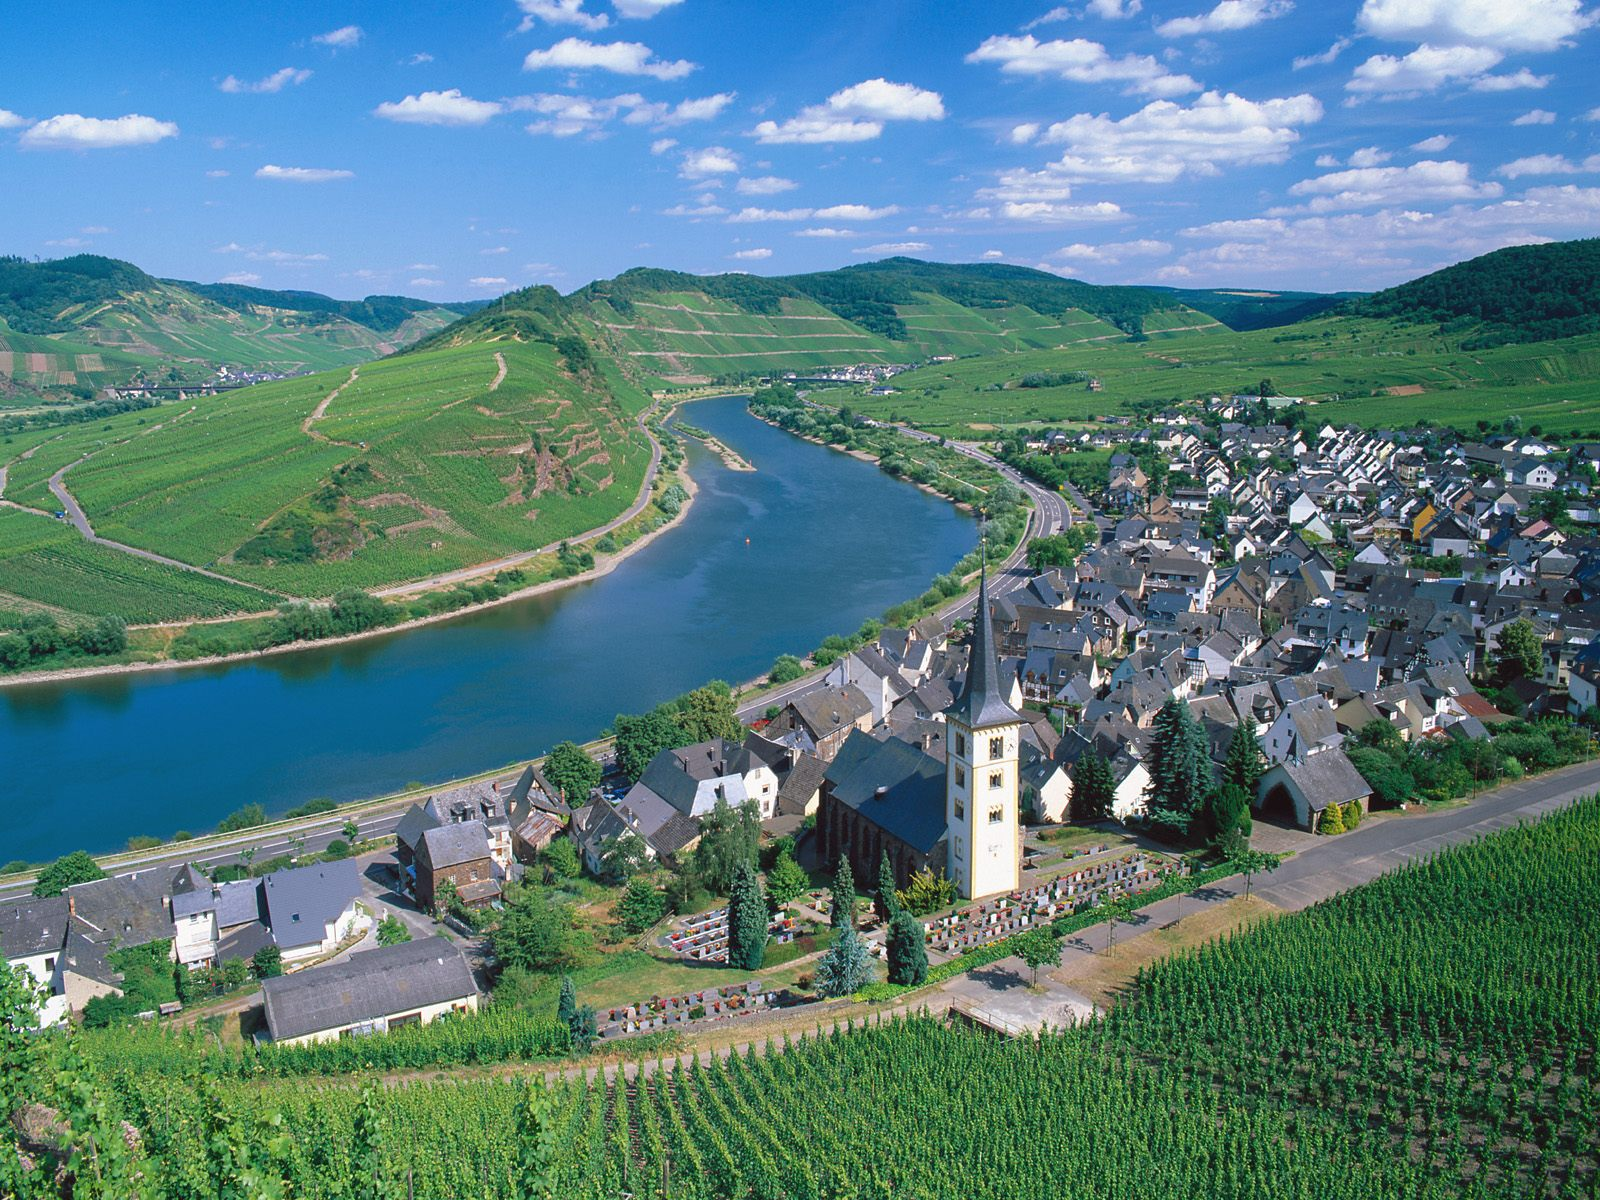 Lorch Village, Hesse, Rhine River, Germany  № 78249  скачать